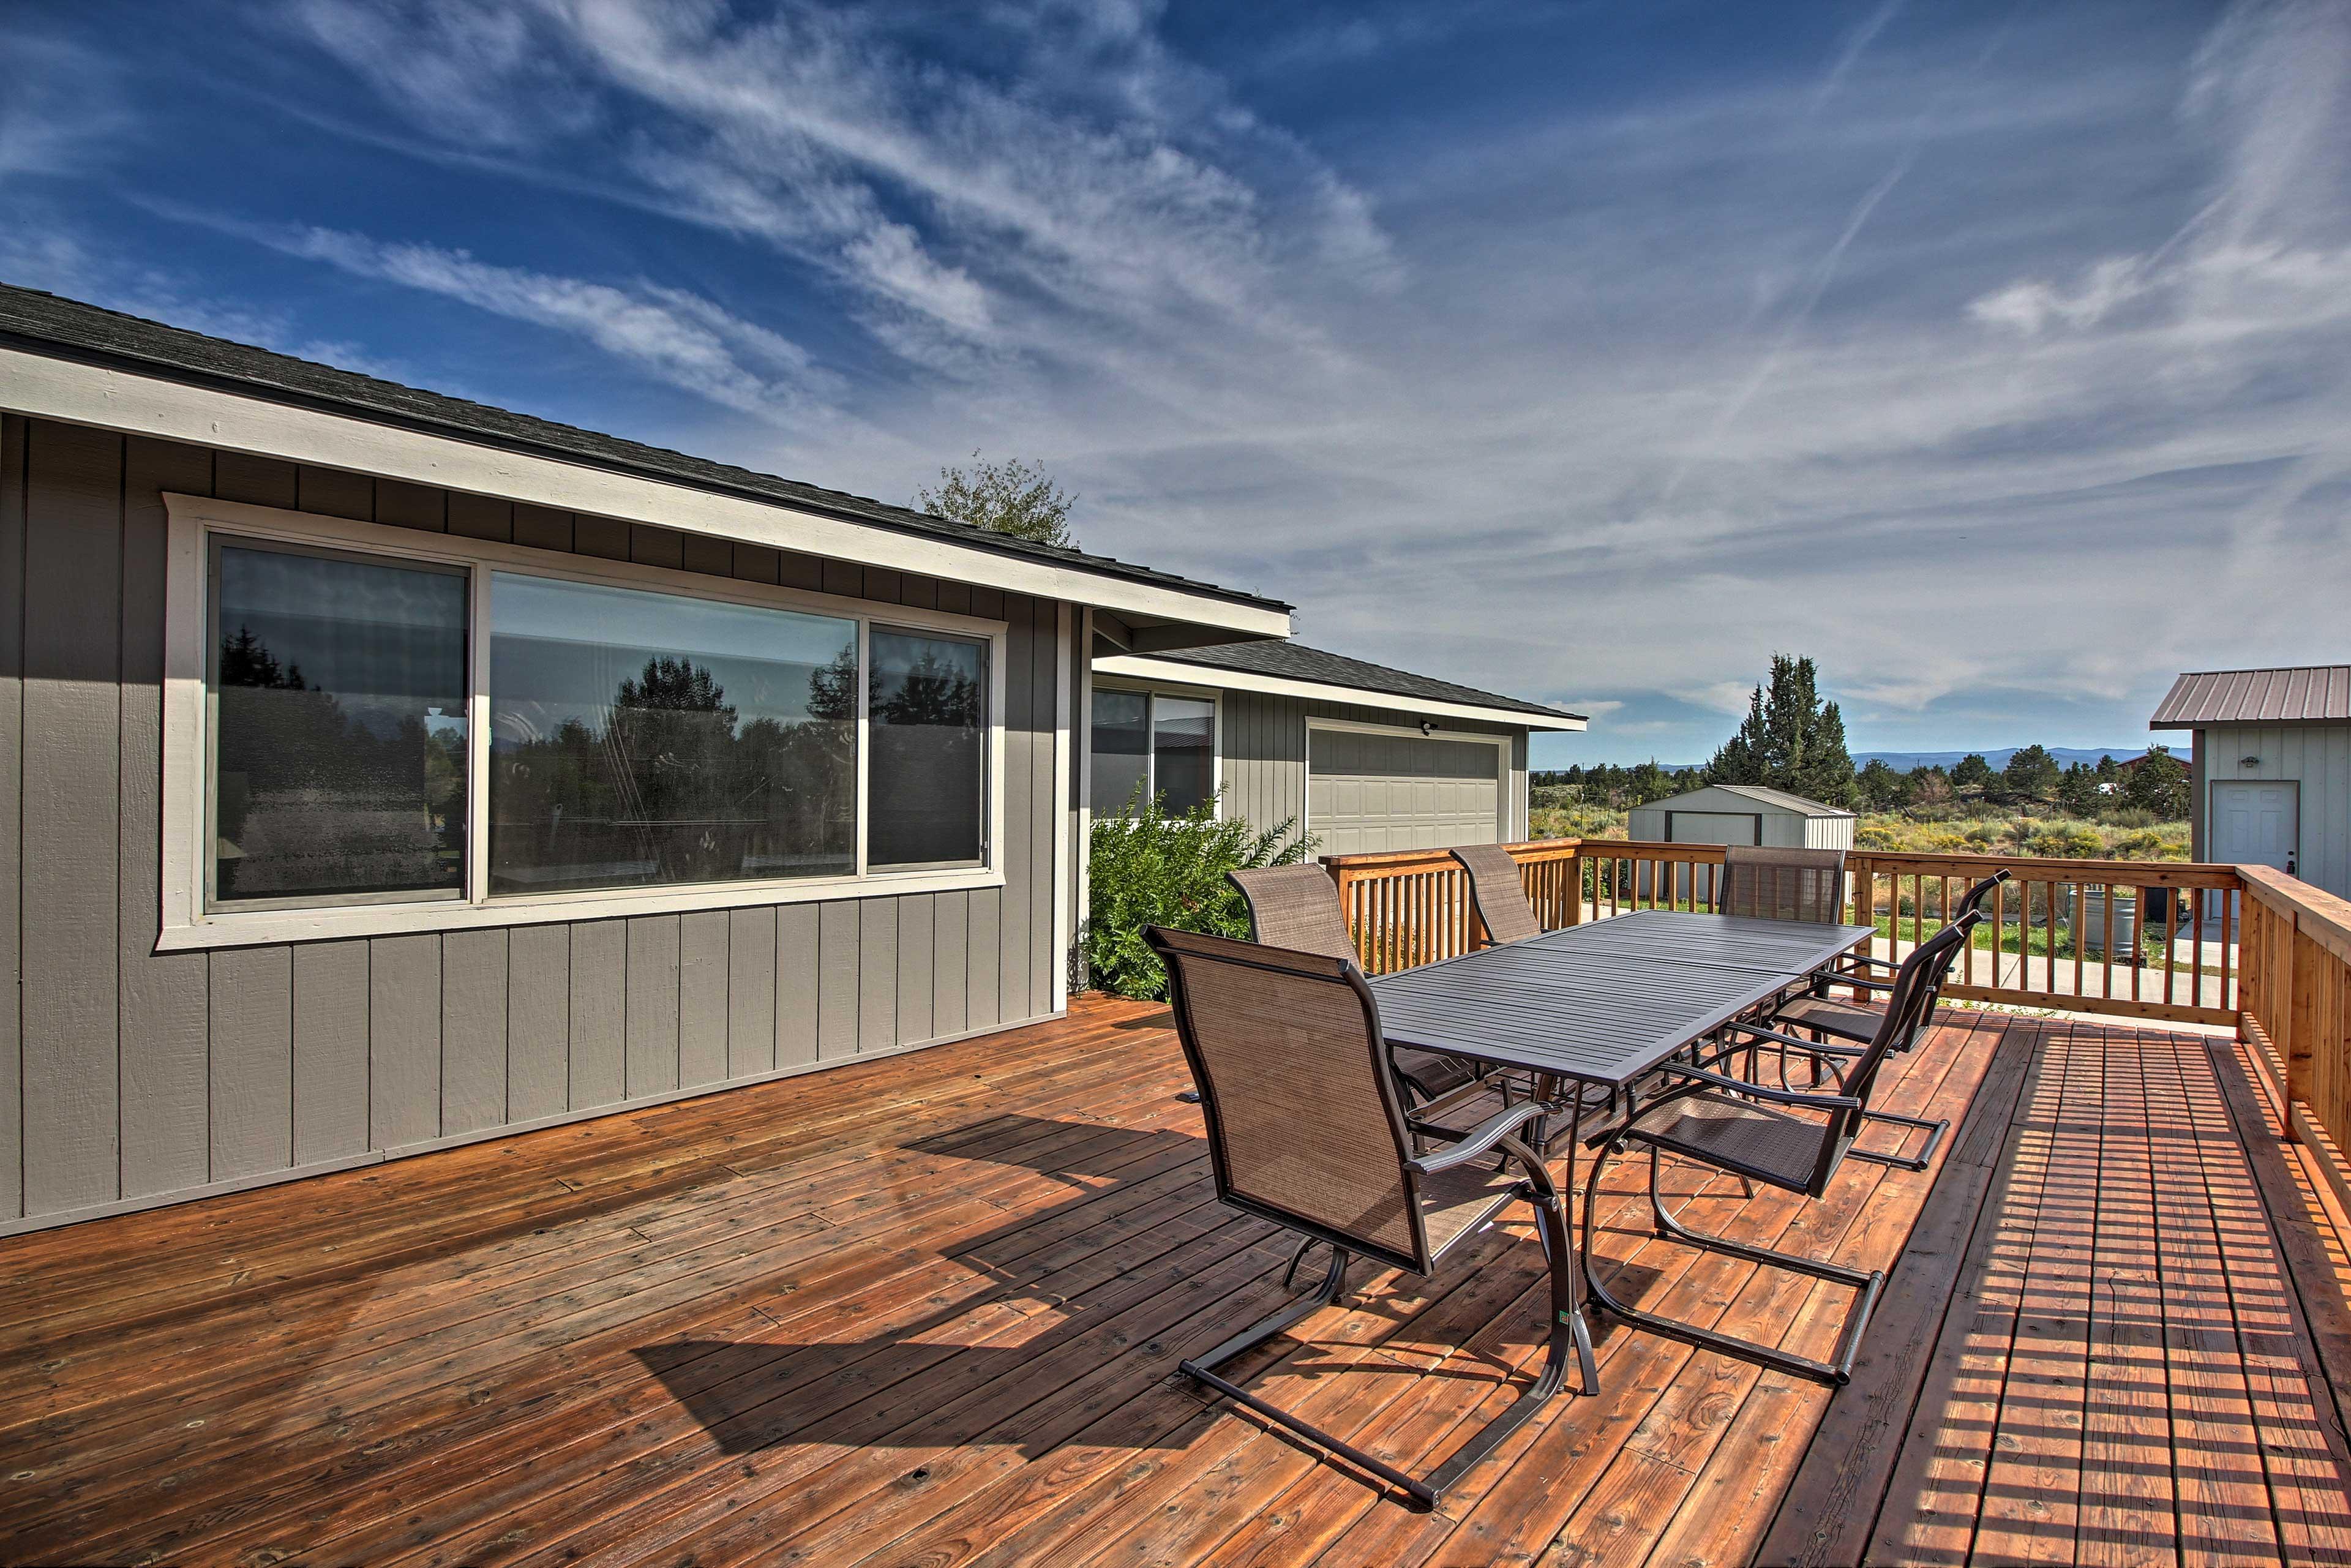 Enjoy stunning views from the BBQ porch.